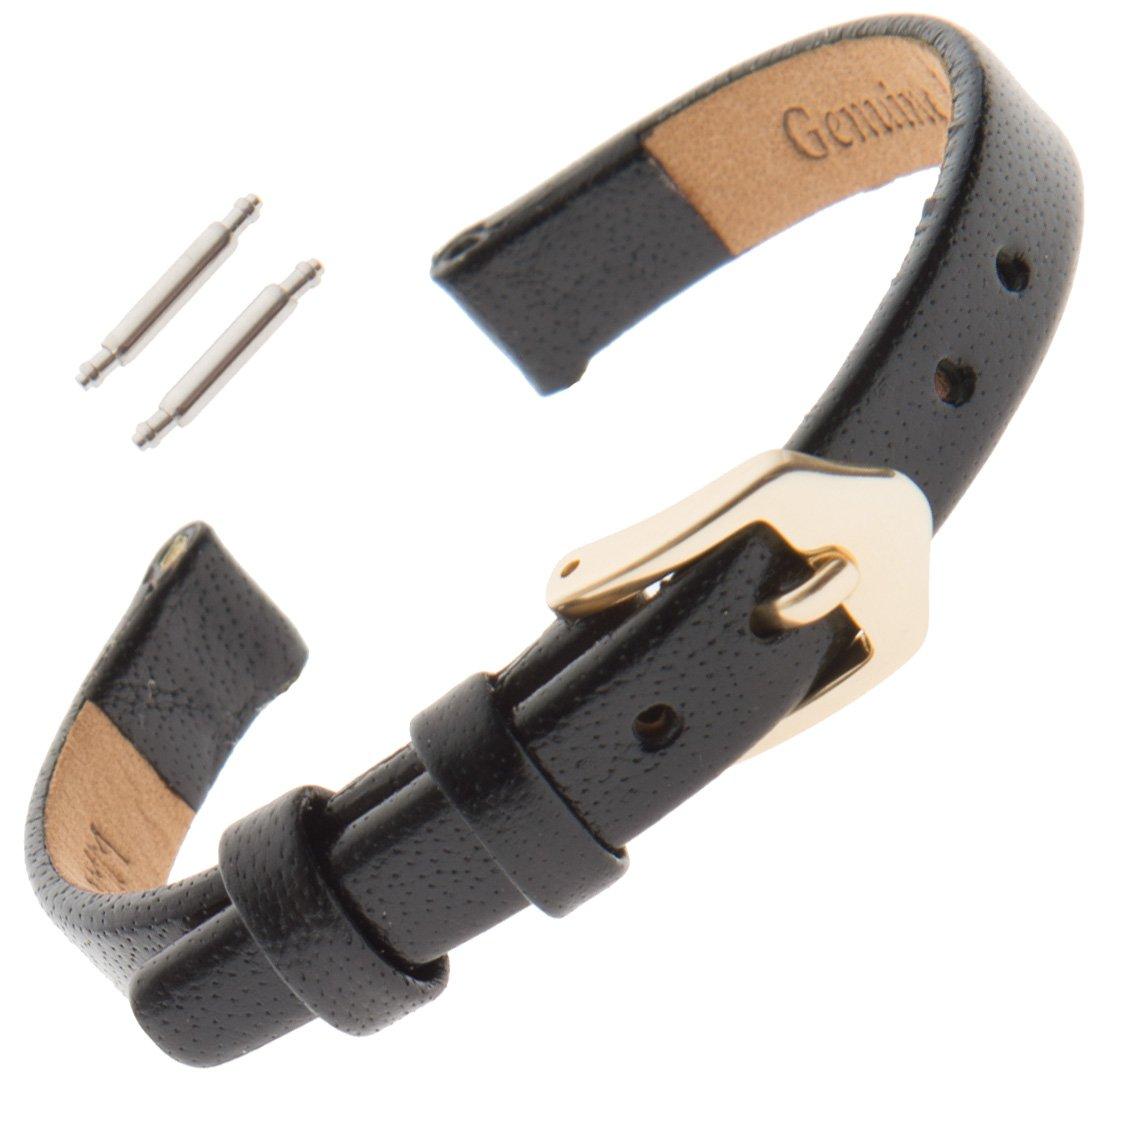 Gilden 6 – 10 mm NarrowフラットPolishedカーフスキンLadies Watchストラップf66 10 millimeter end width ブラック 10 millimeter end width|ブラック ブラック 10 millimeter end width B07CV2K9KK